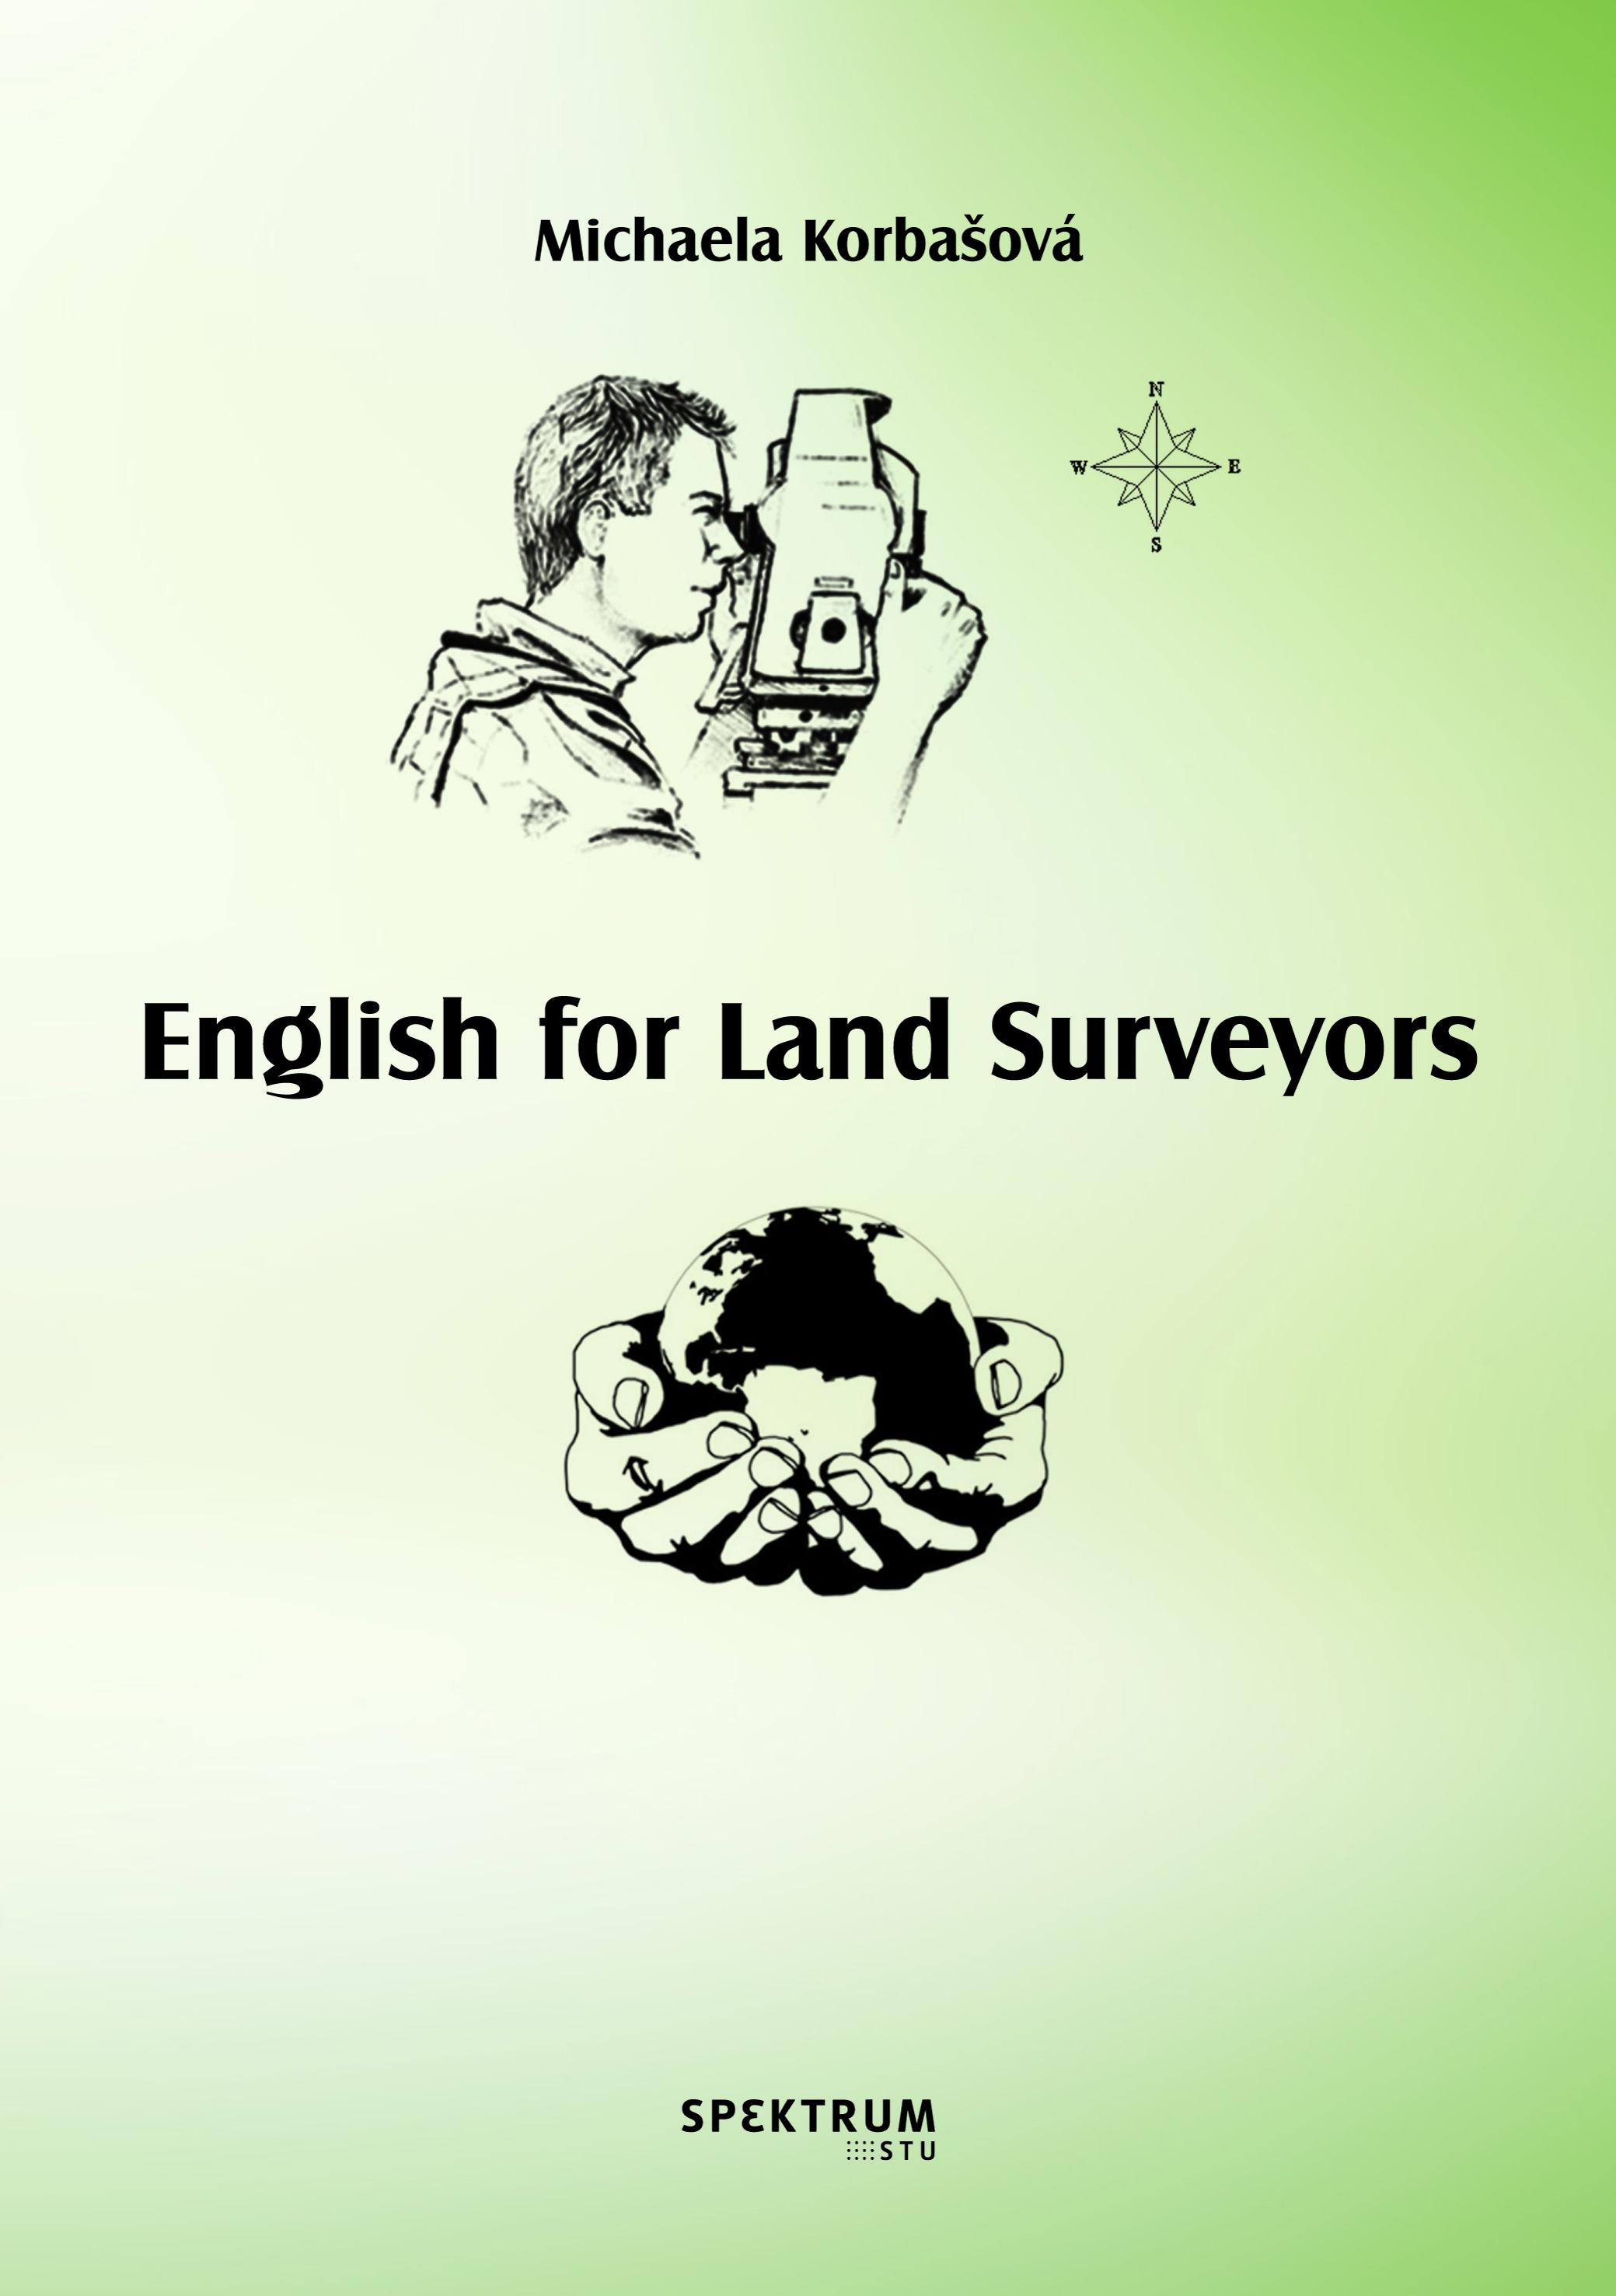 English for Land Surveyors